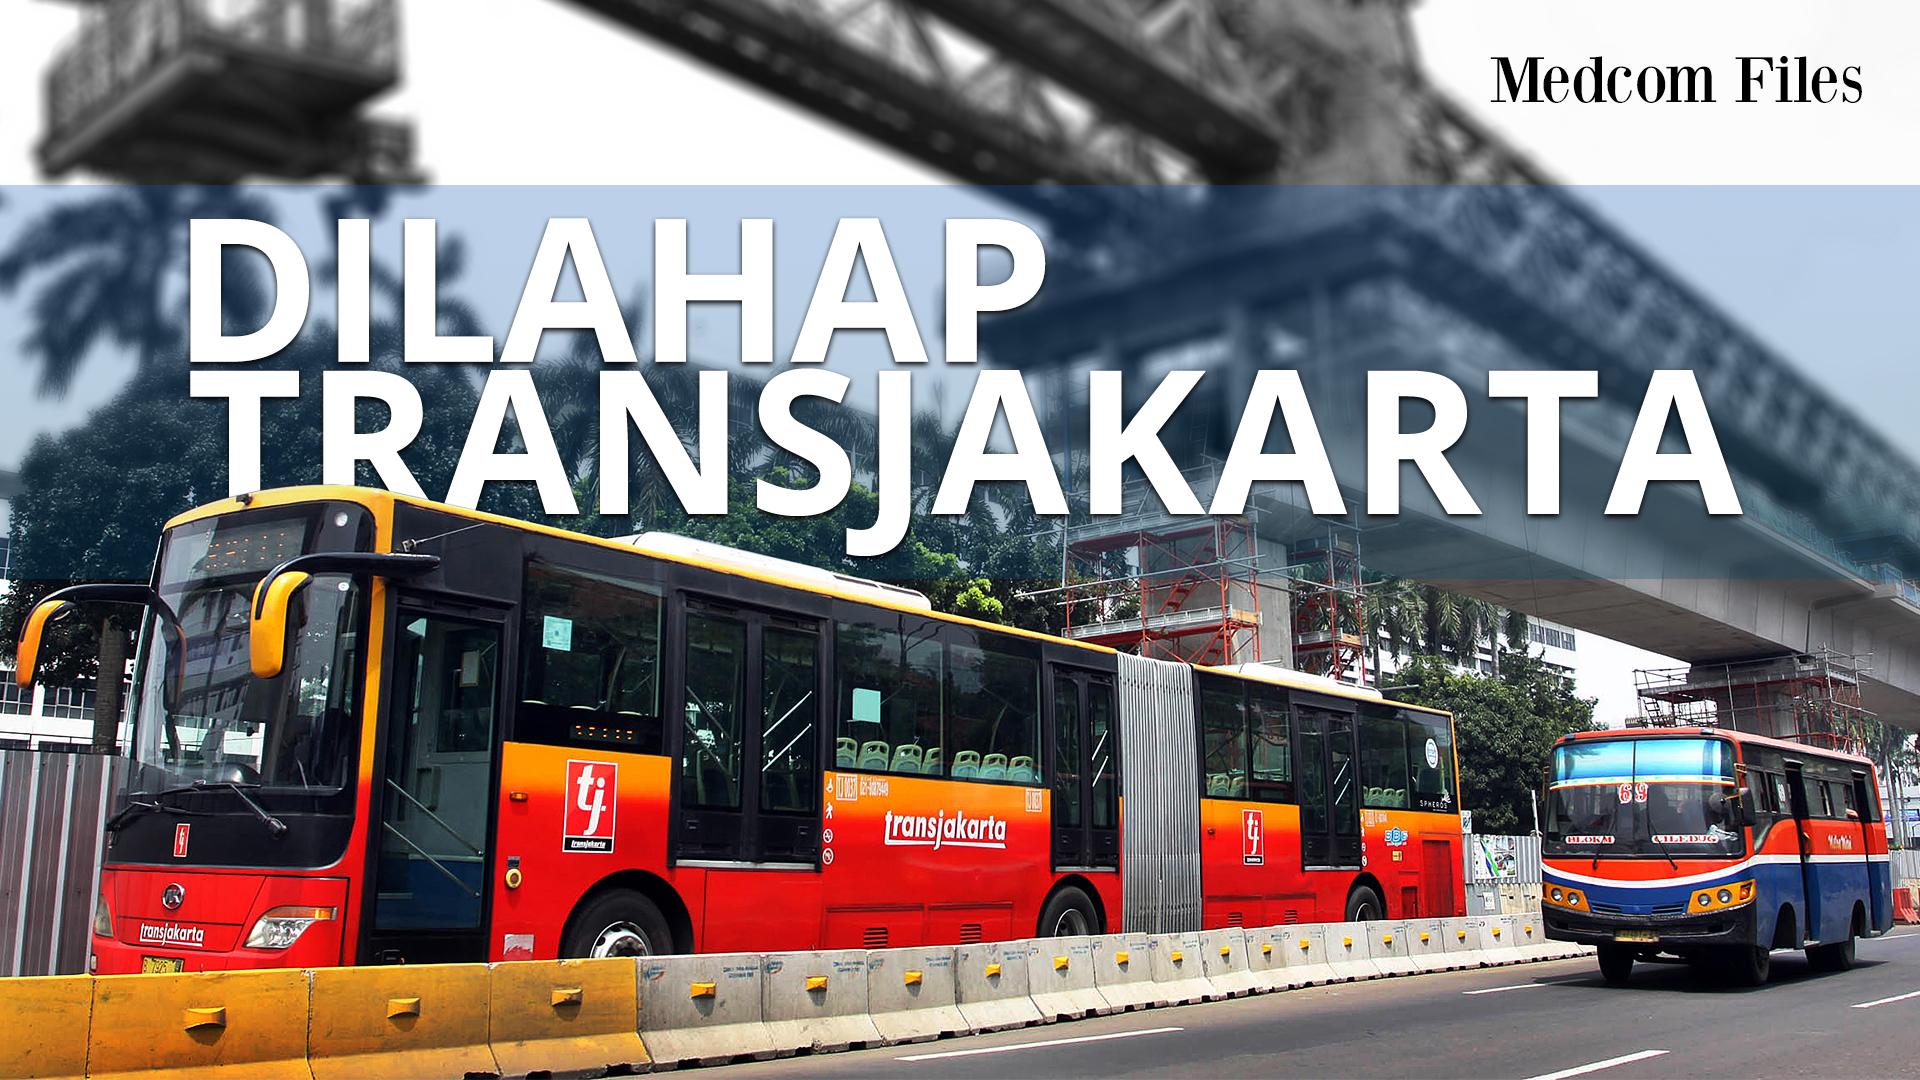 Dilahap Transjakarta